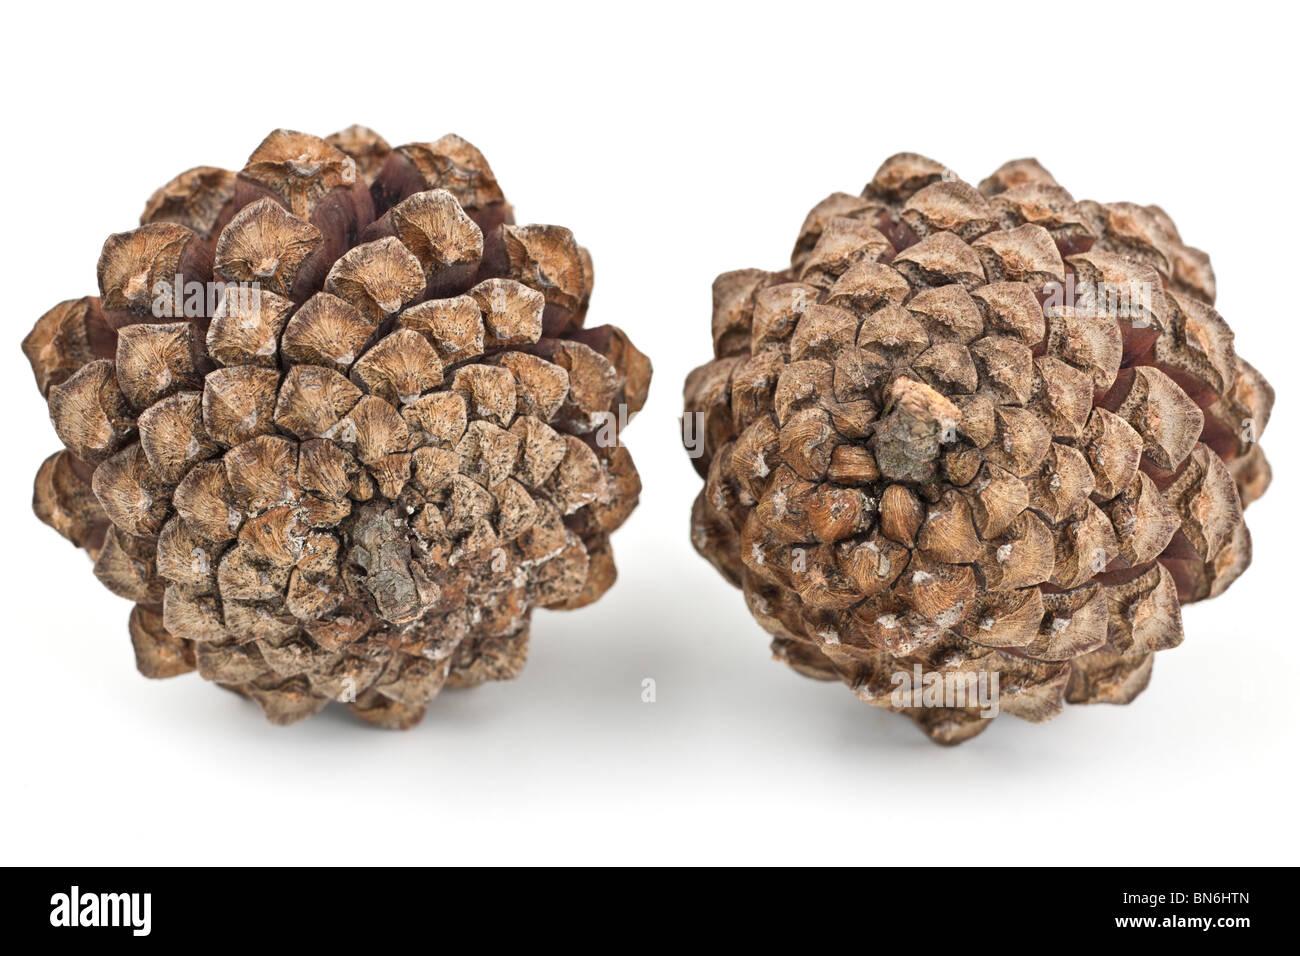 Underside of  two pine cones - Stock Image